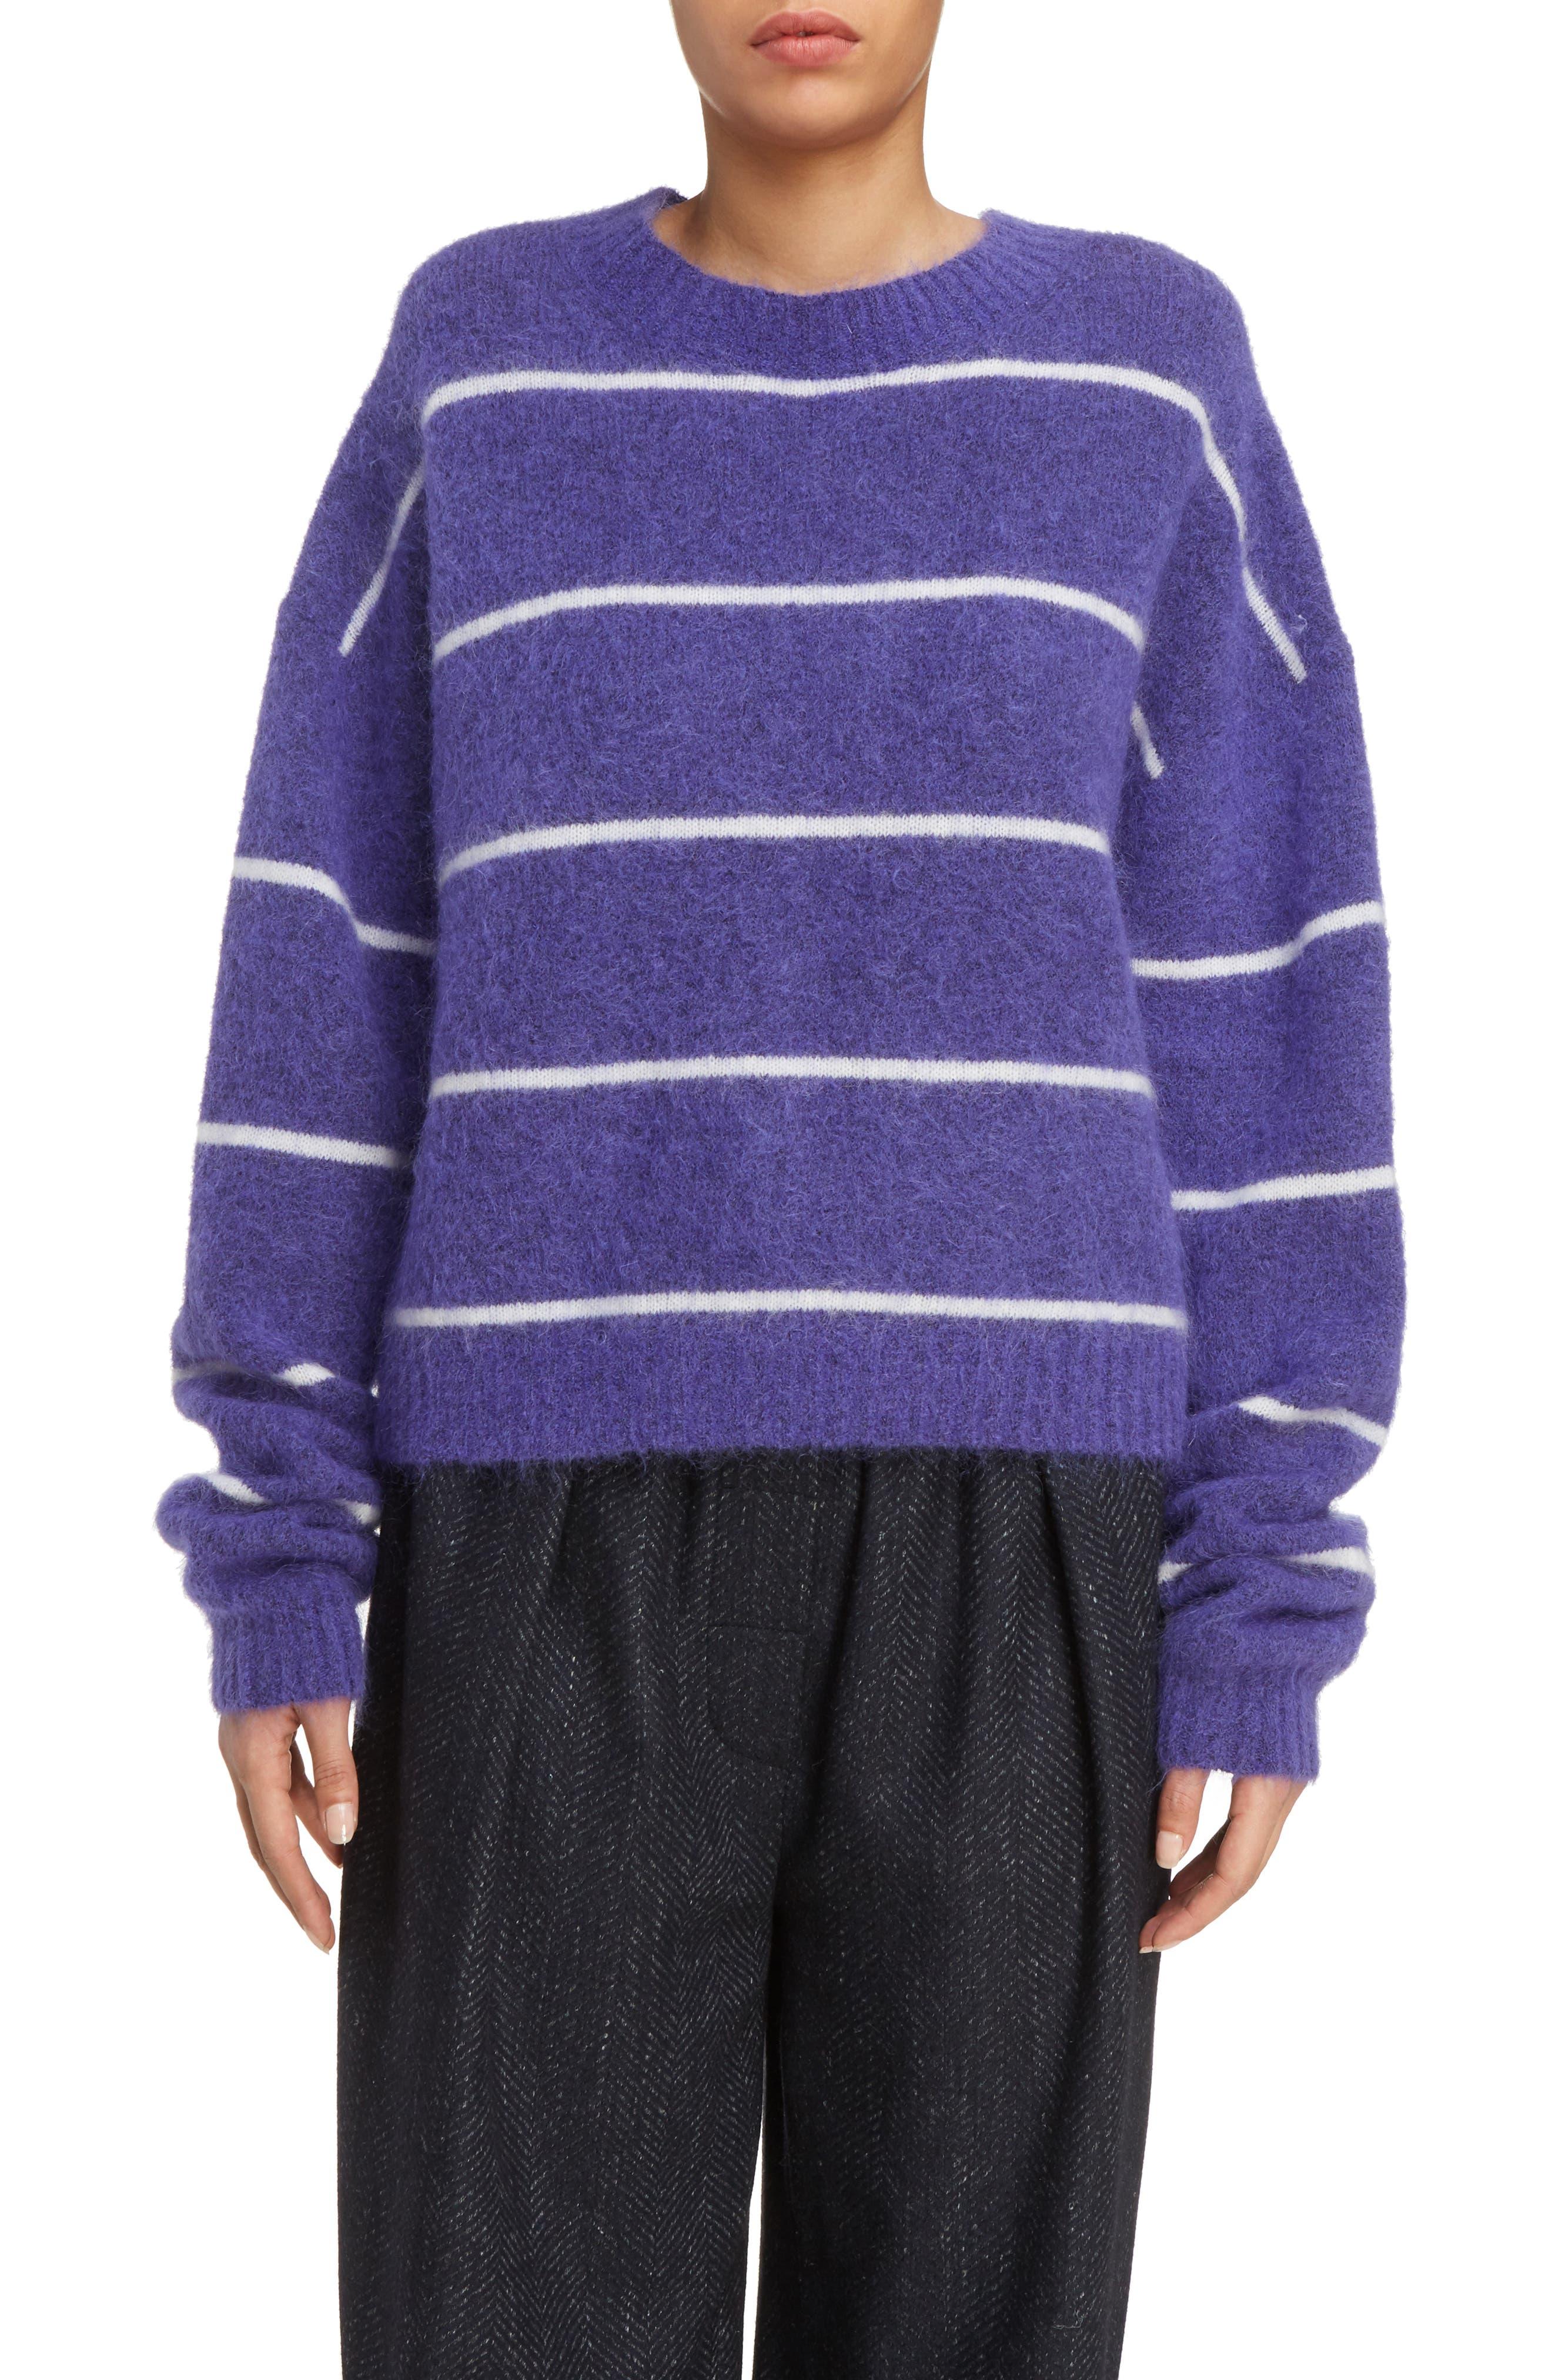 Rhira Stripe Crewneck Sweater,                             Main thumbnail 1, color,                             500